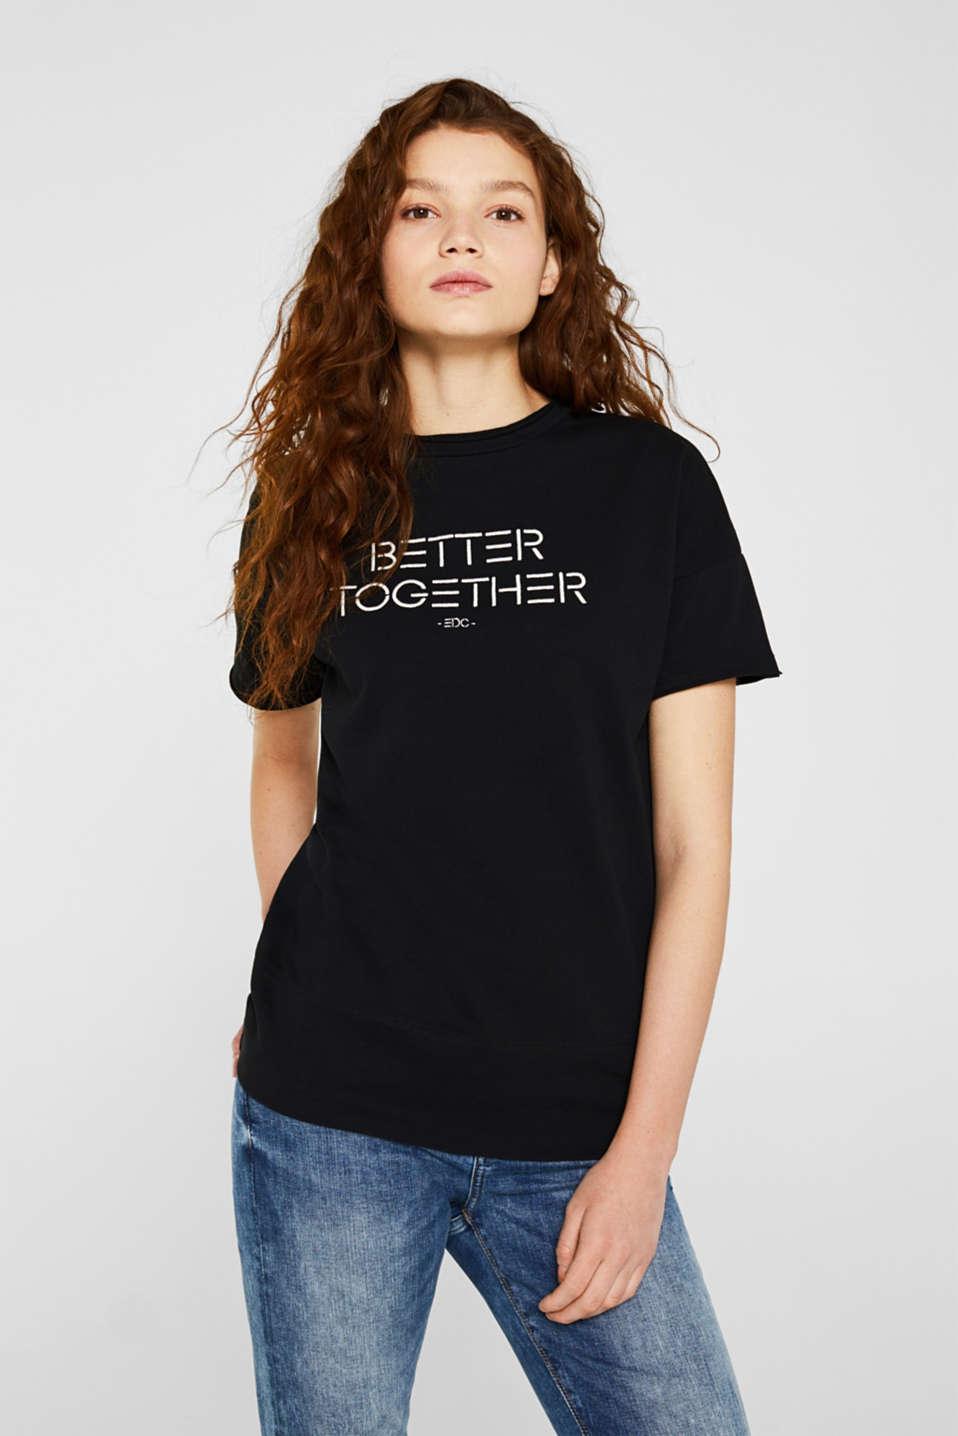 Embroidered sweatshirt, 100% cotton